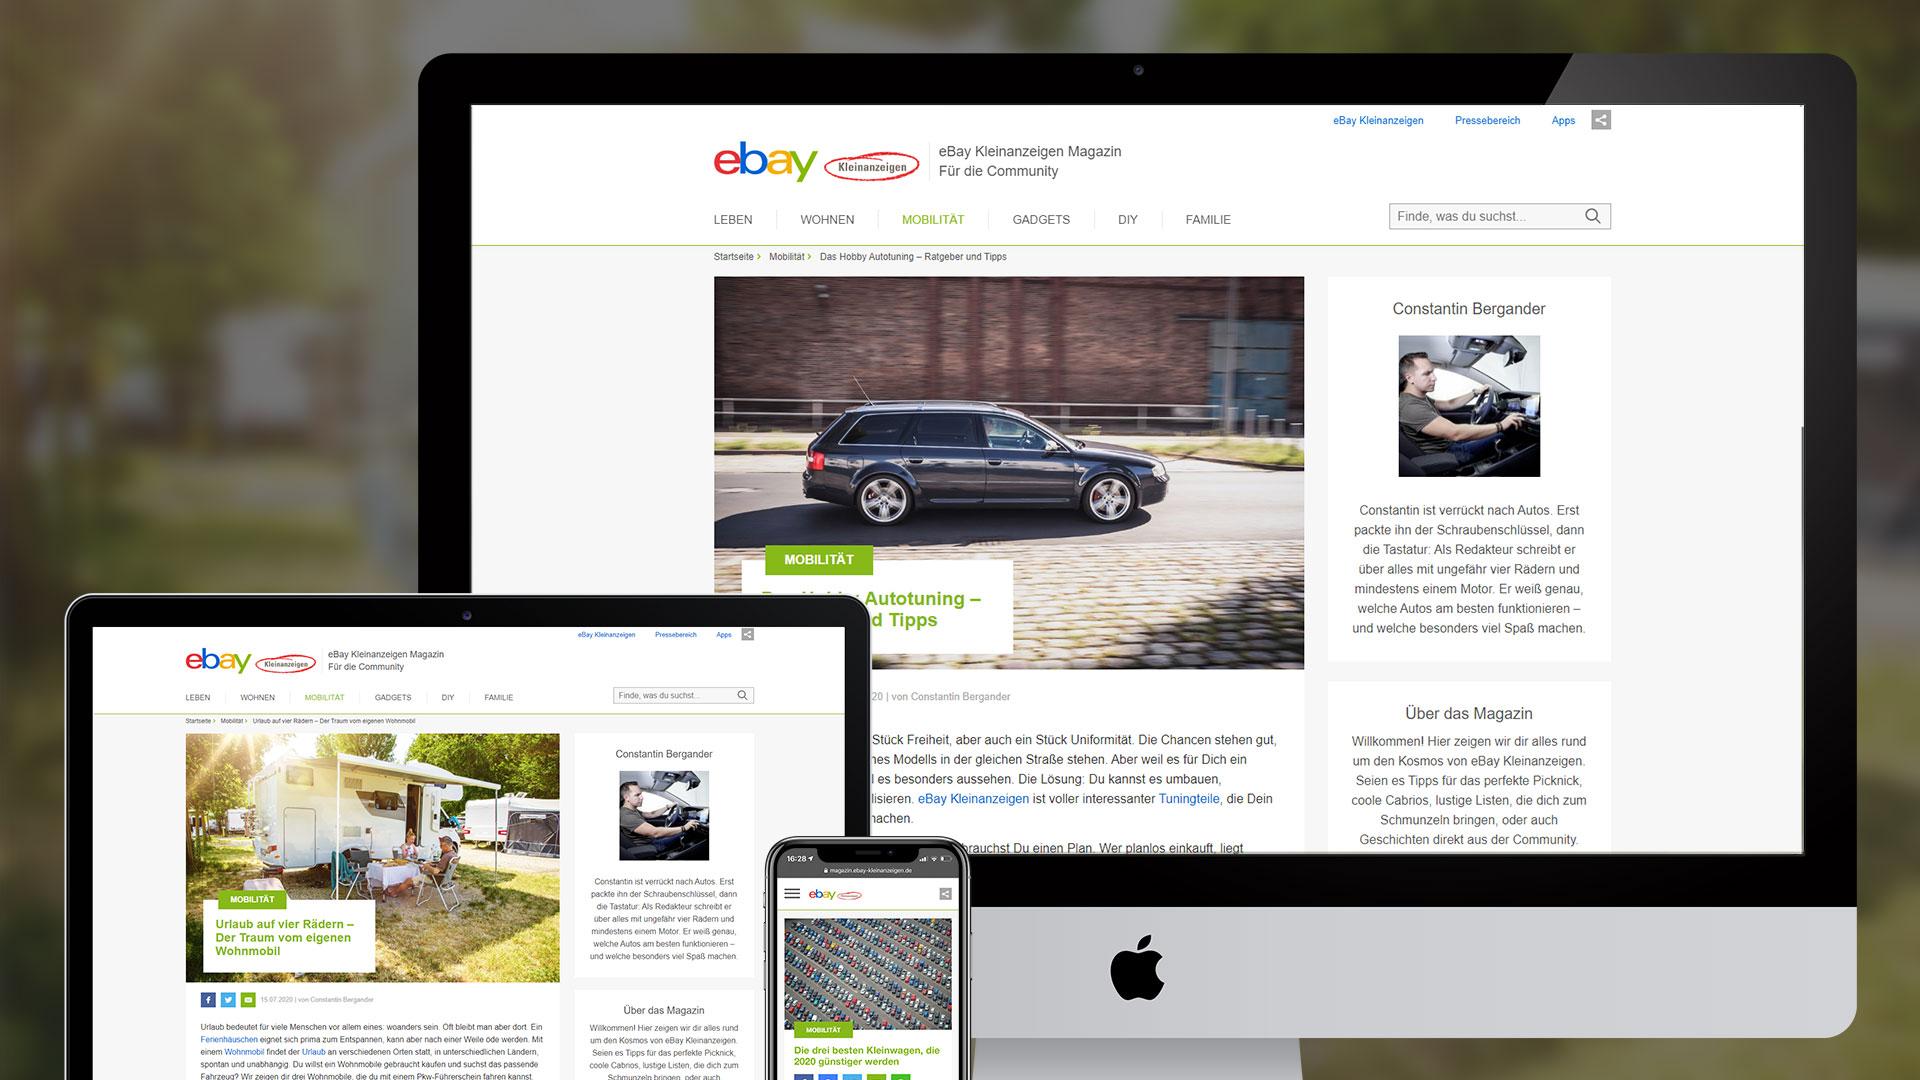 Ebay_Magazin.png